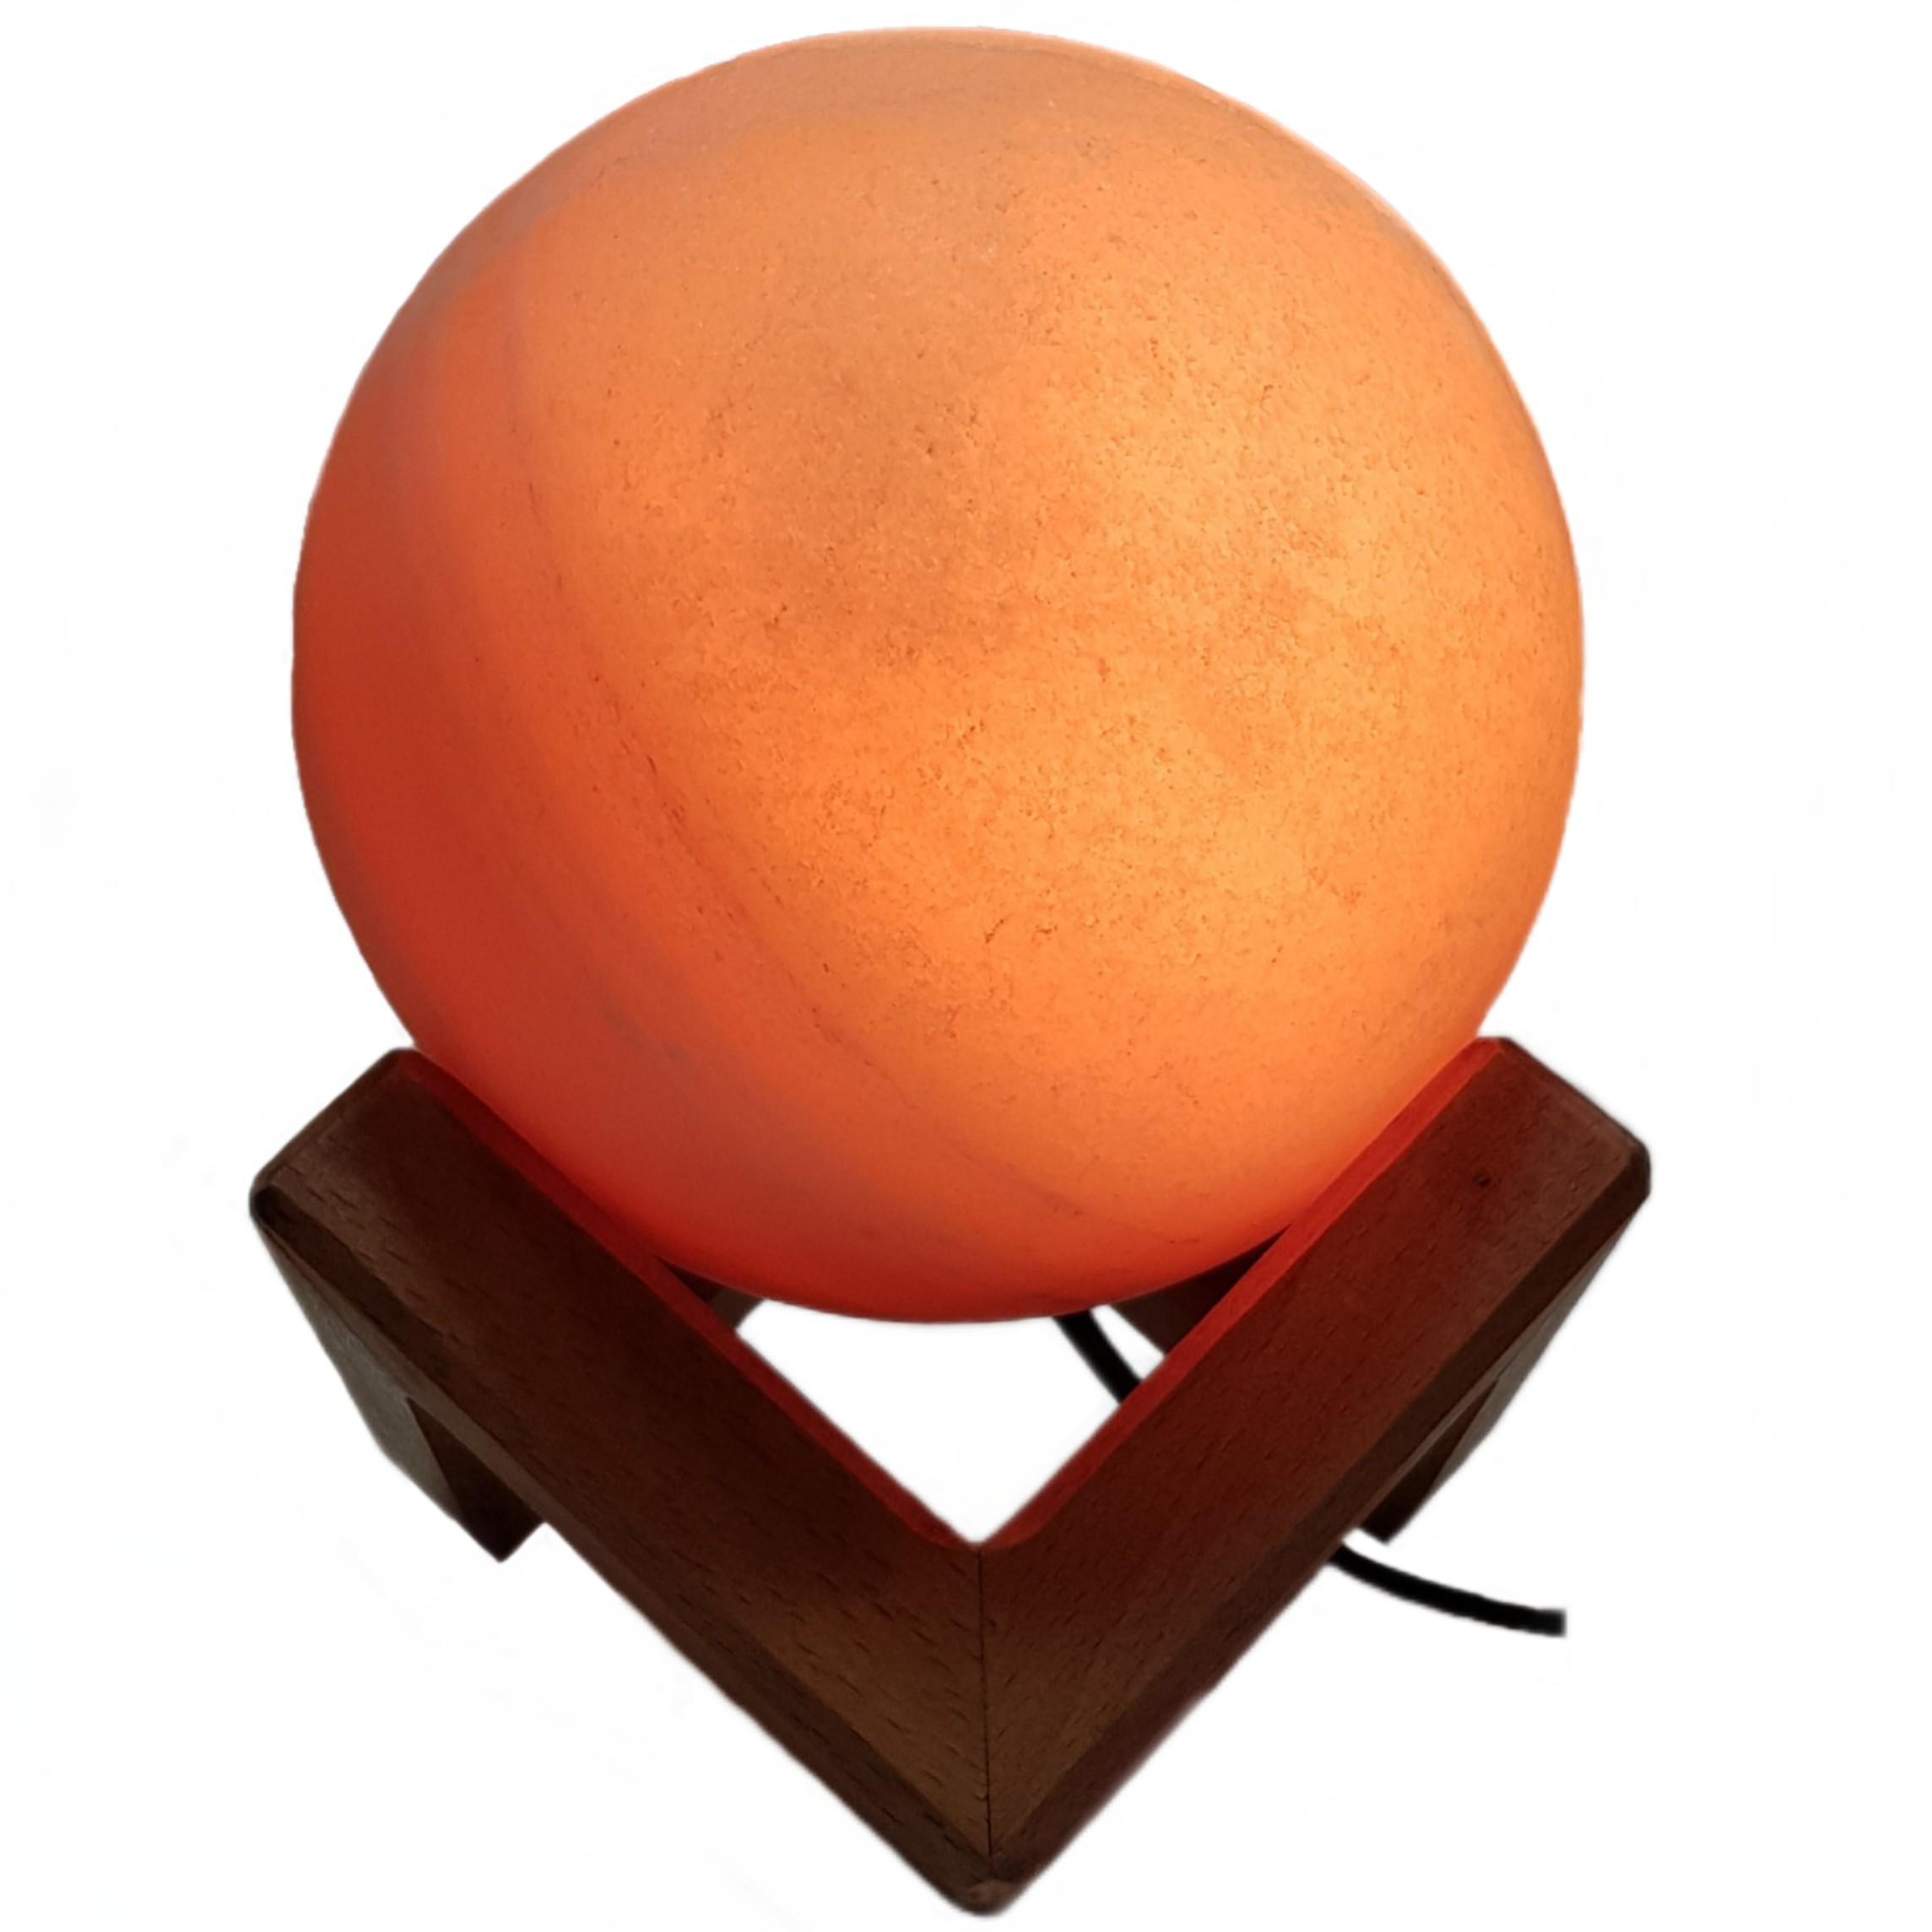 چراغ خواب سنگ نمک مدل EESS05p